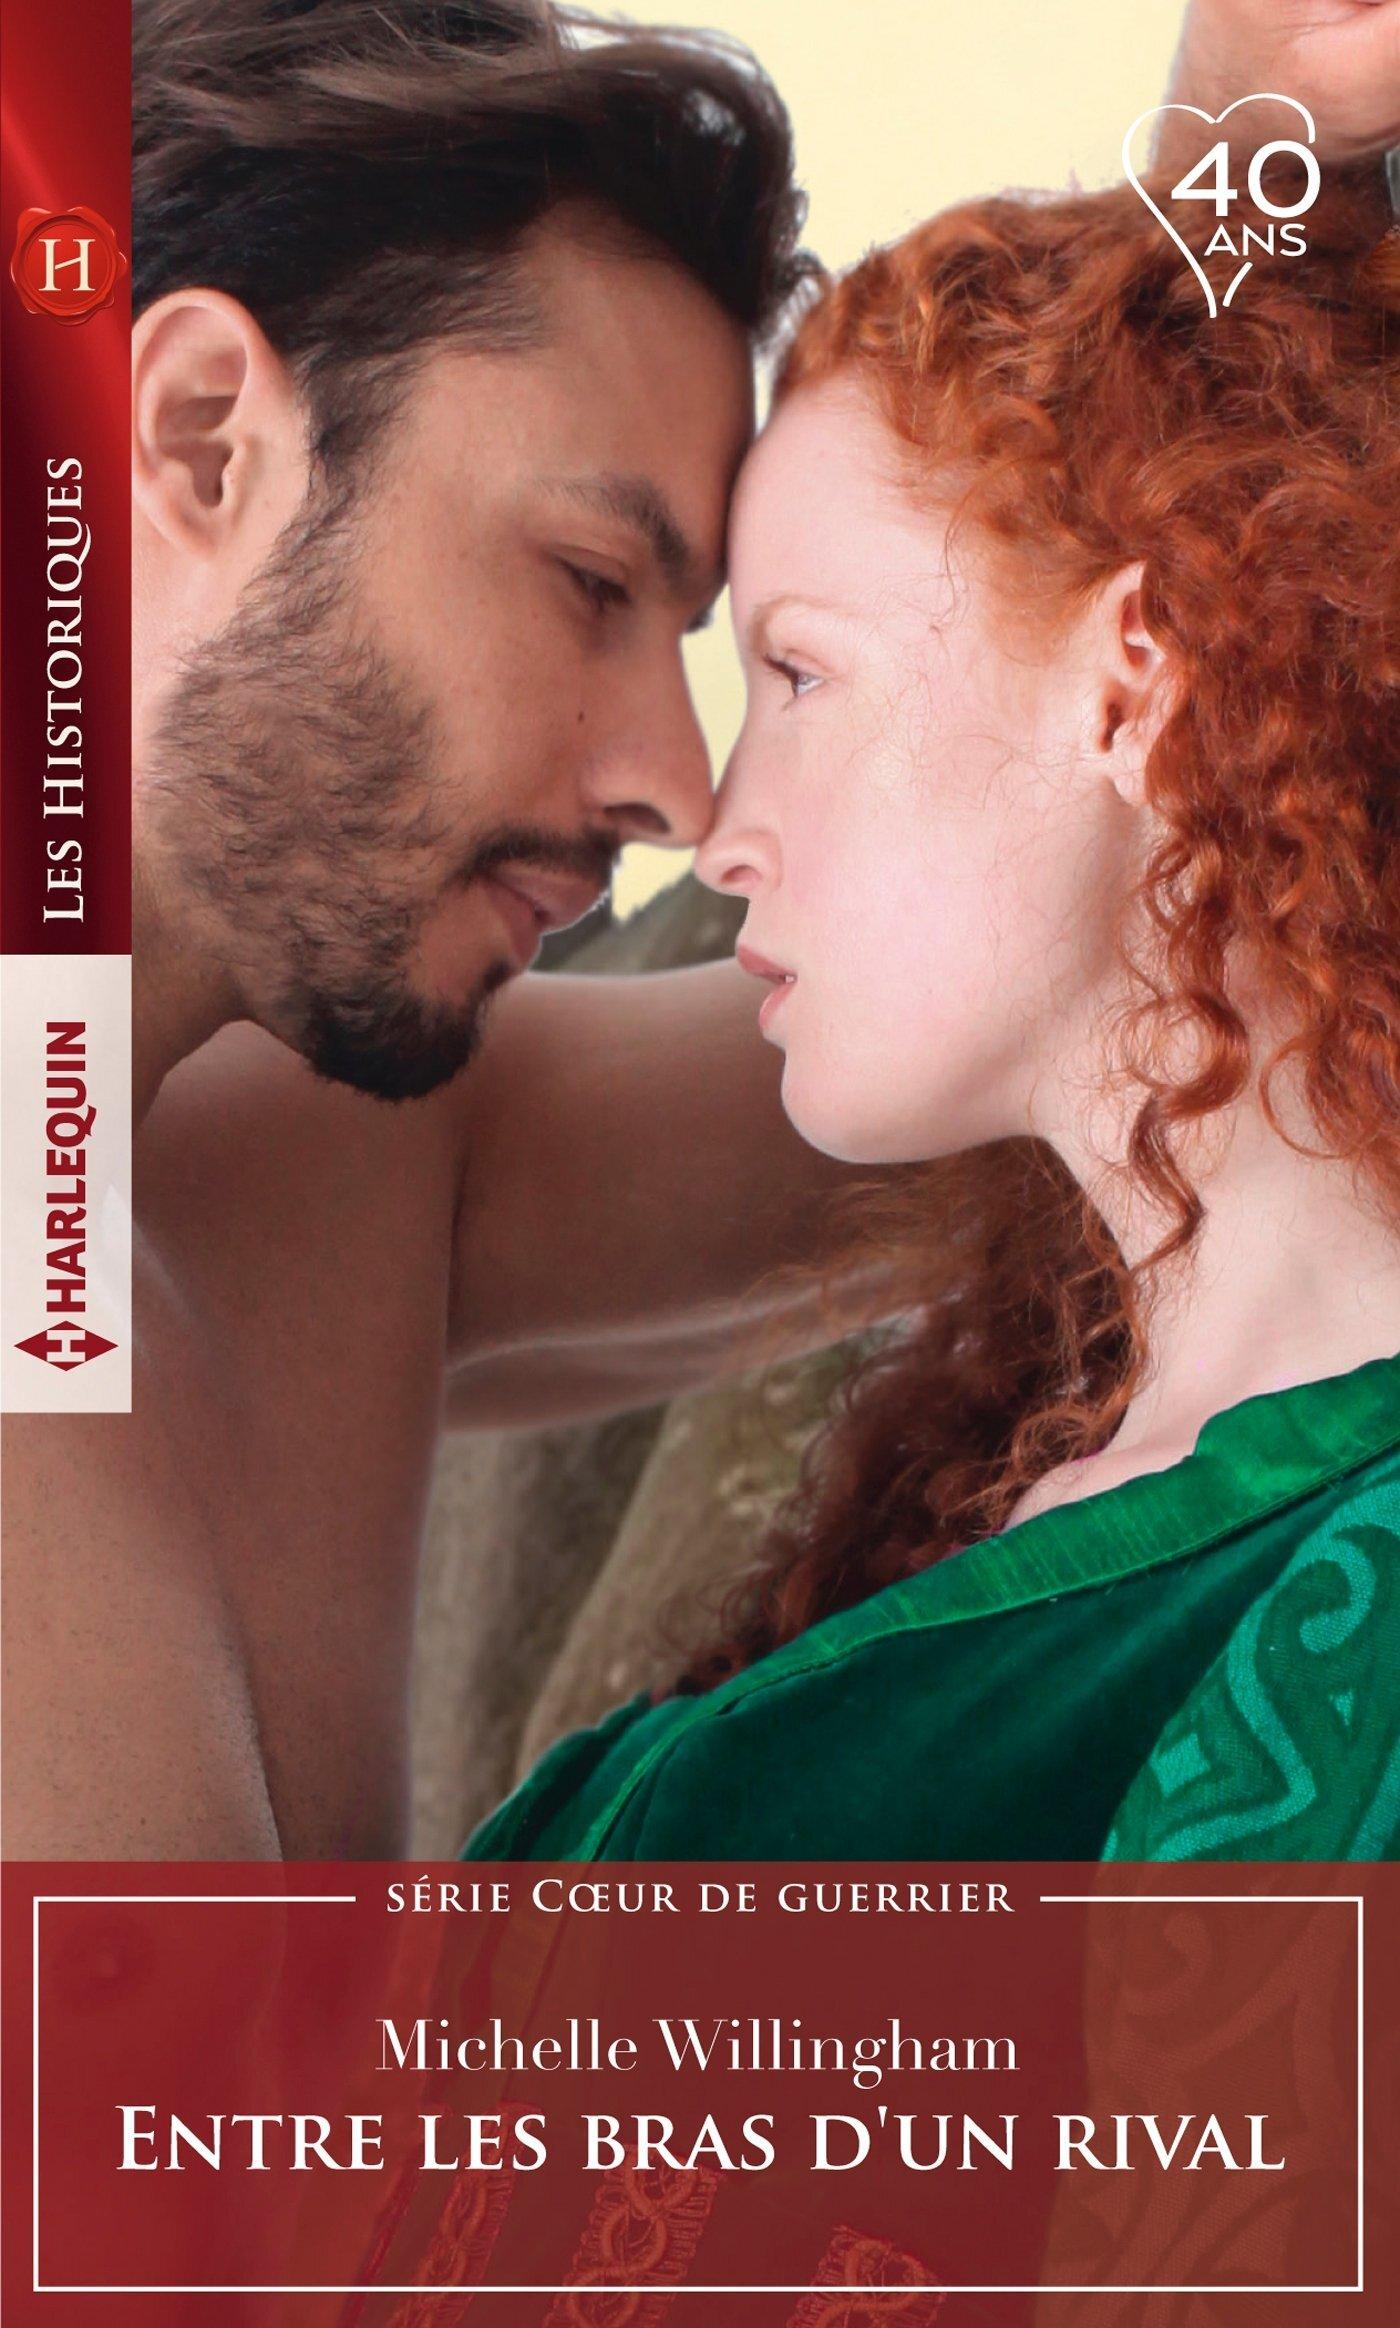 cdn1.booknode.com/book_cover/1109/full/coeur-de-guerrier-tome-2-entre-les-bras-d-un-rival-1108665.jpg